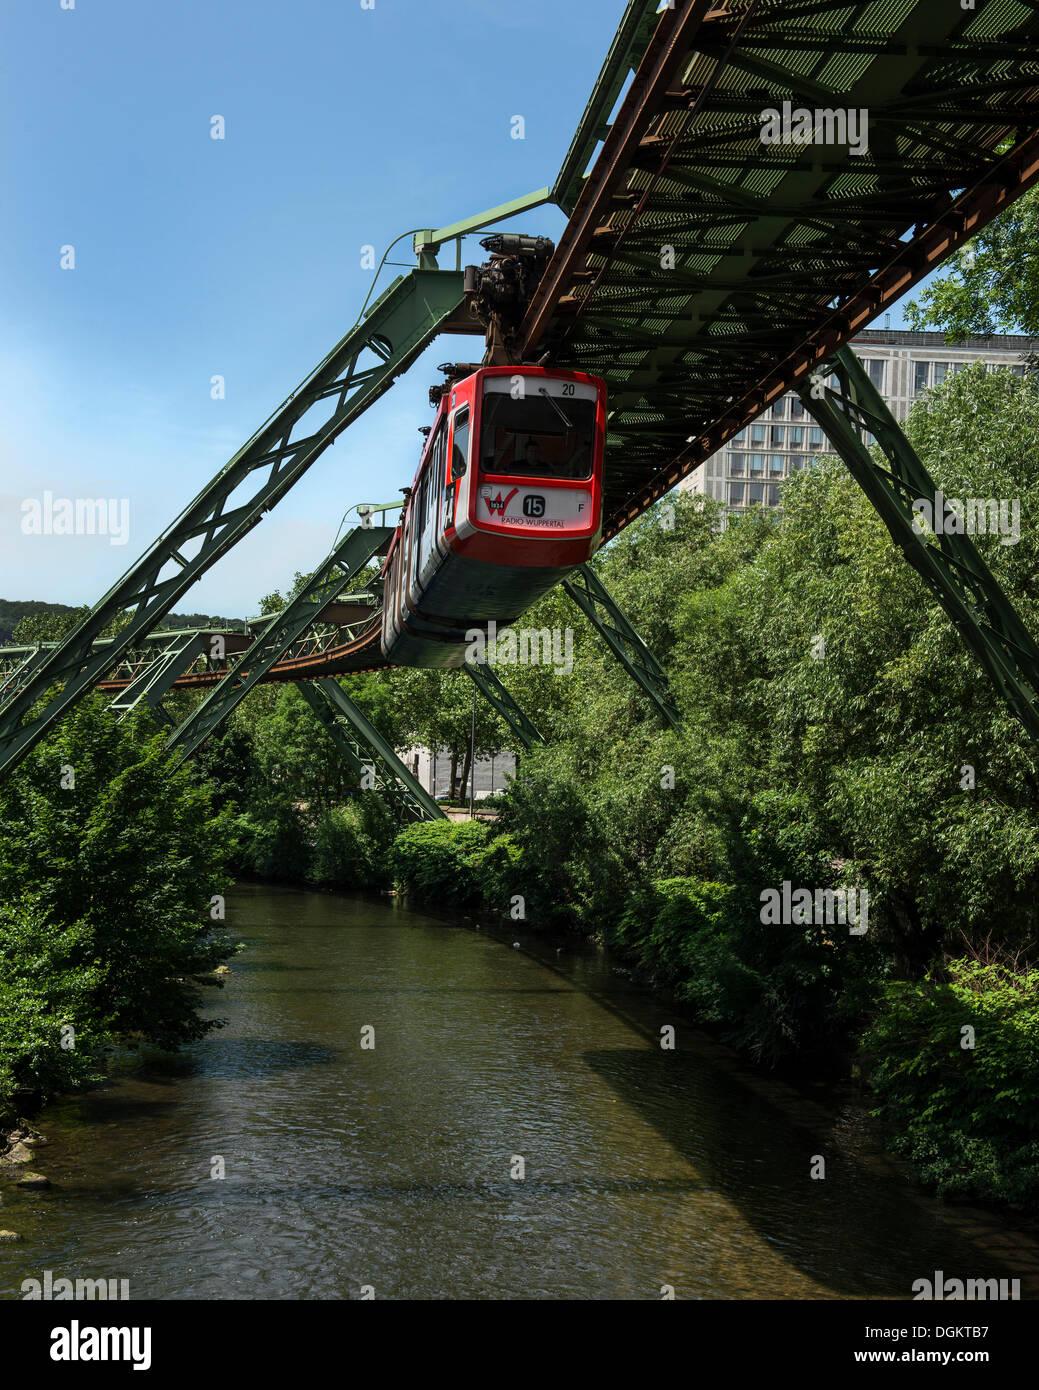 Wuppertal Schwebebahn or Wuppertal Floating Tram, suspension railway over the Wupper river, landmark of Wuppertal - Stock Image